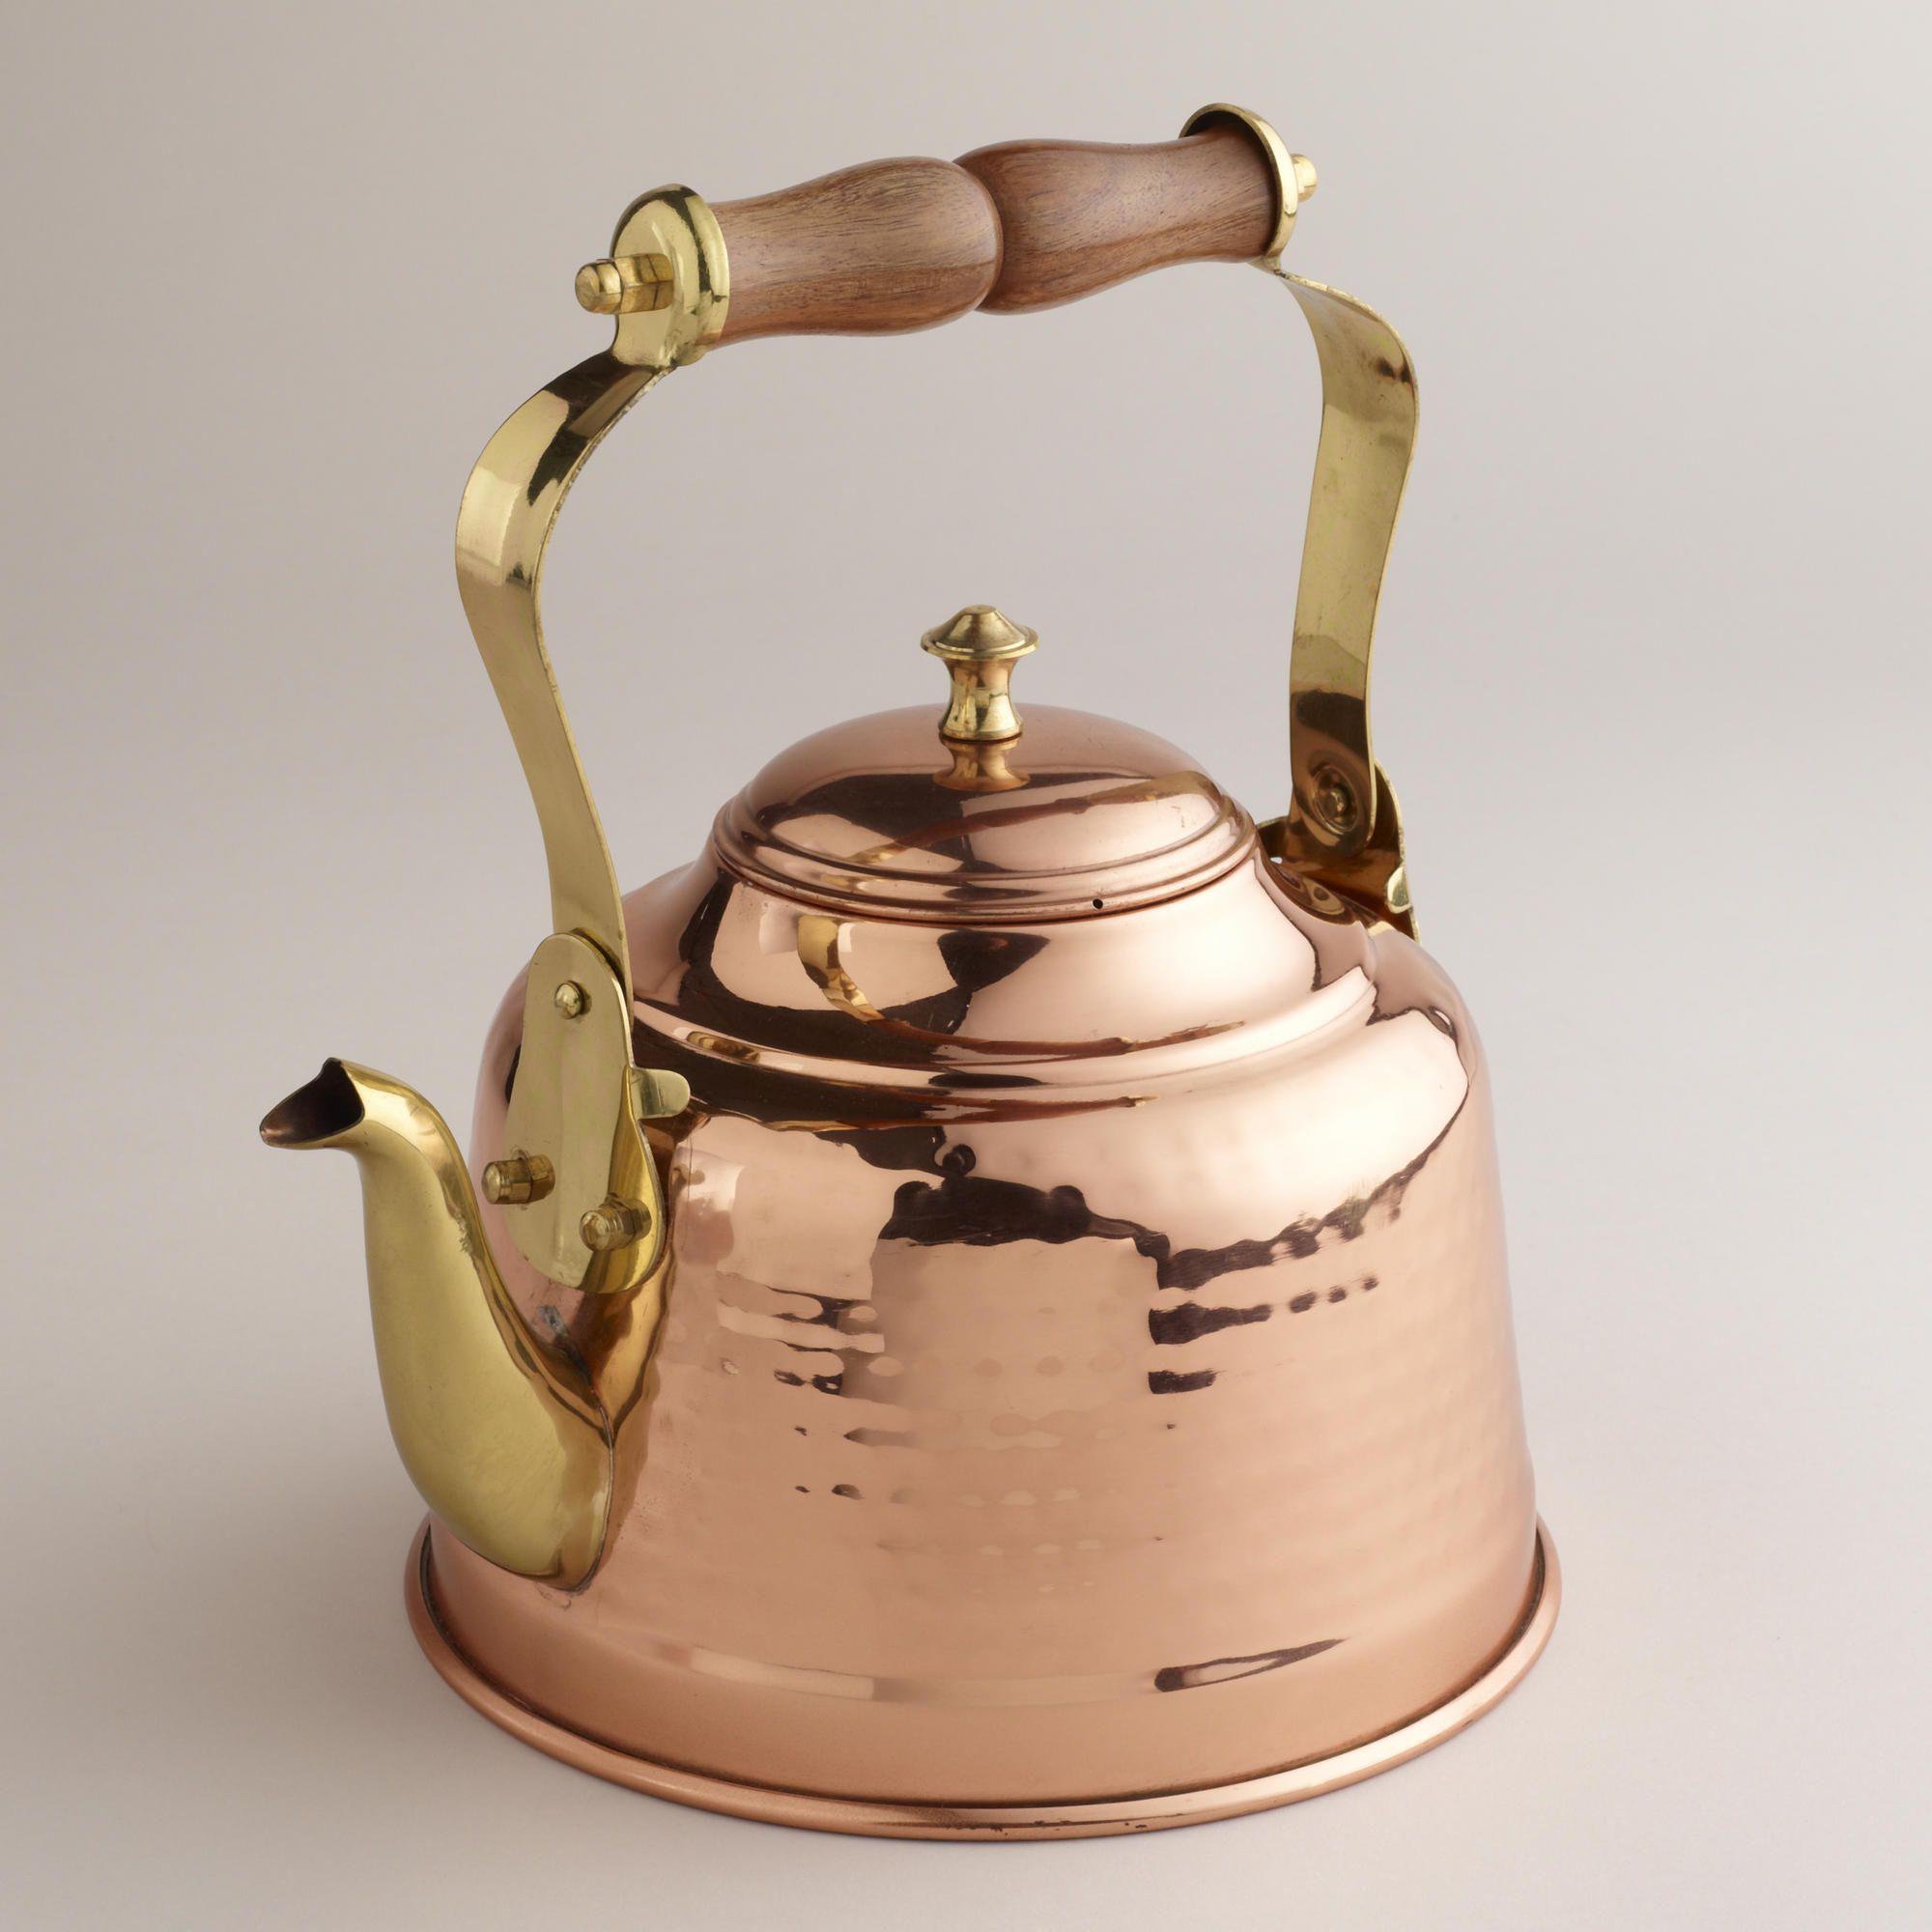 Hammered Copper Tea Kettle soooo beautiful, but sadly